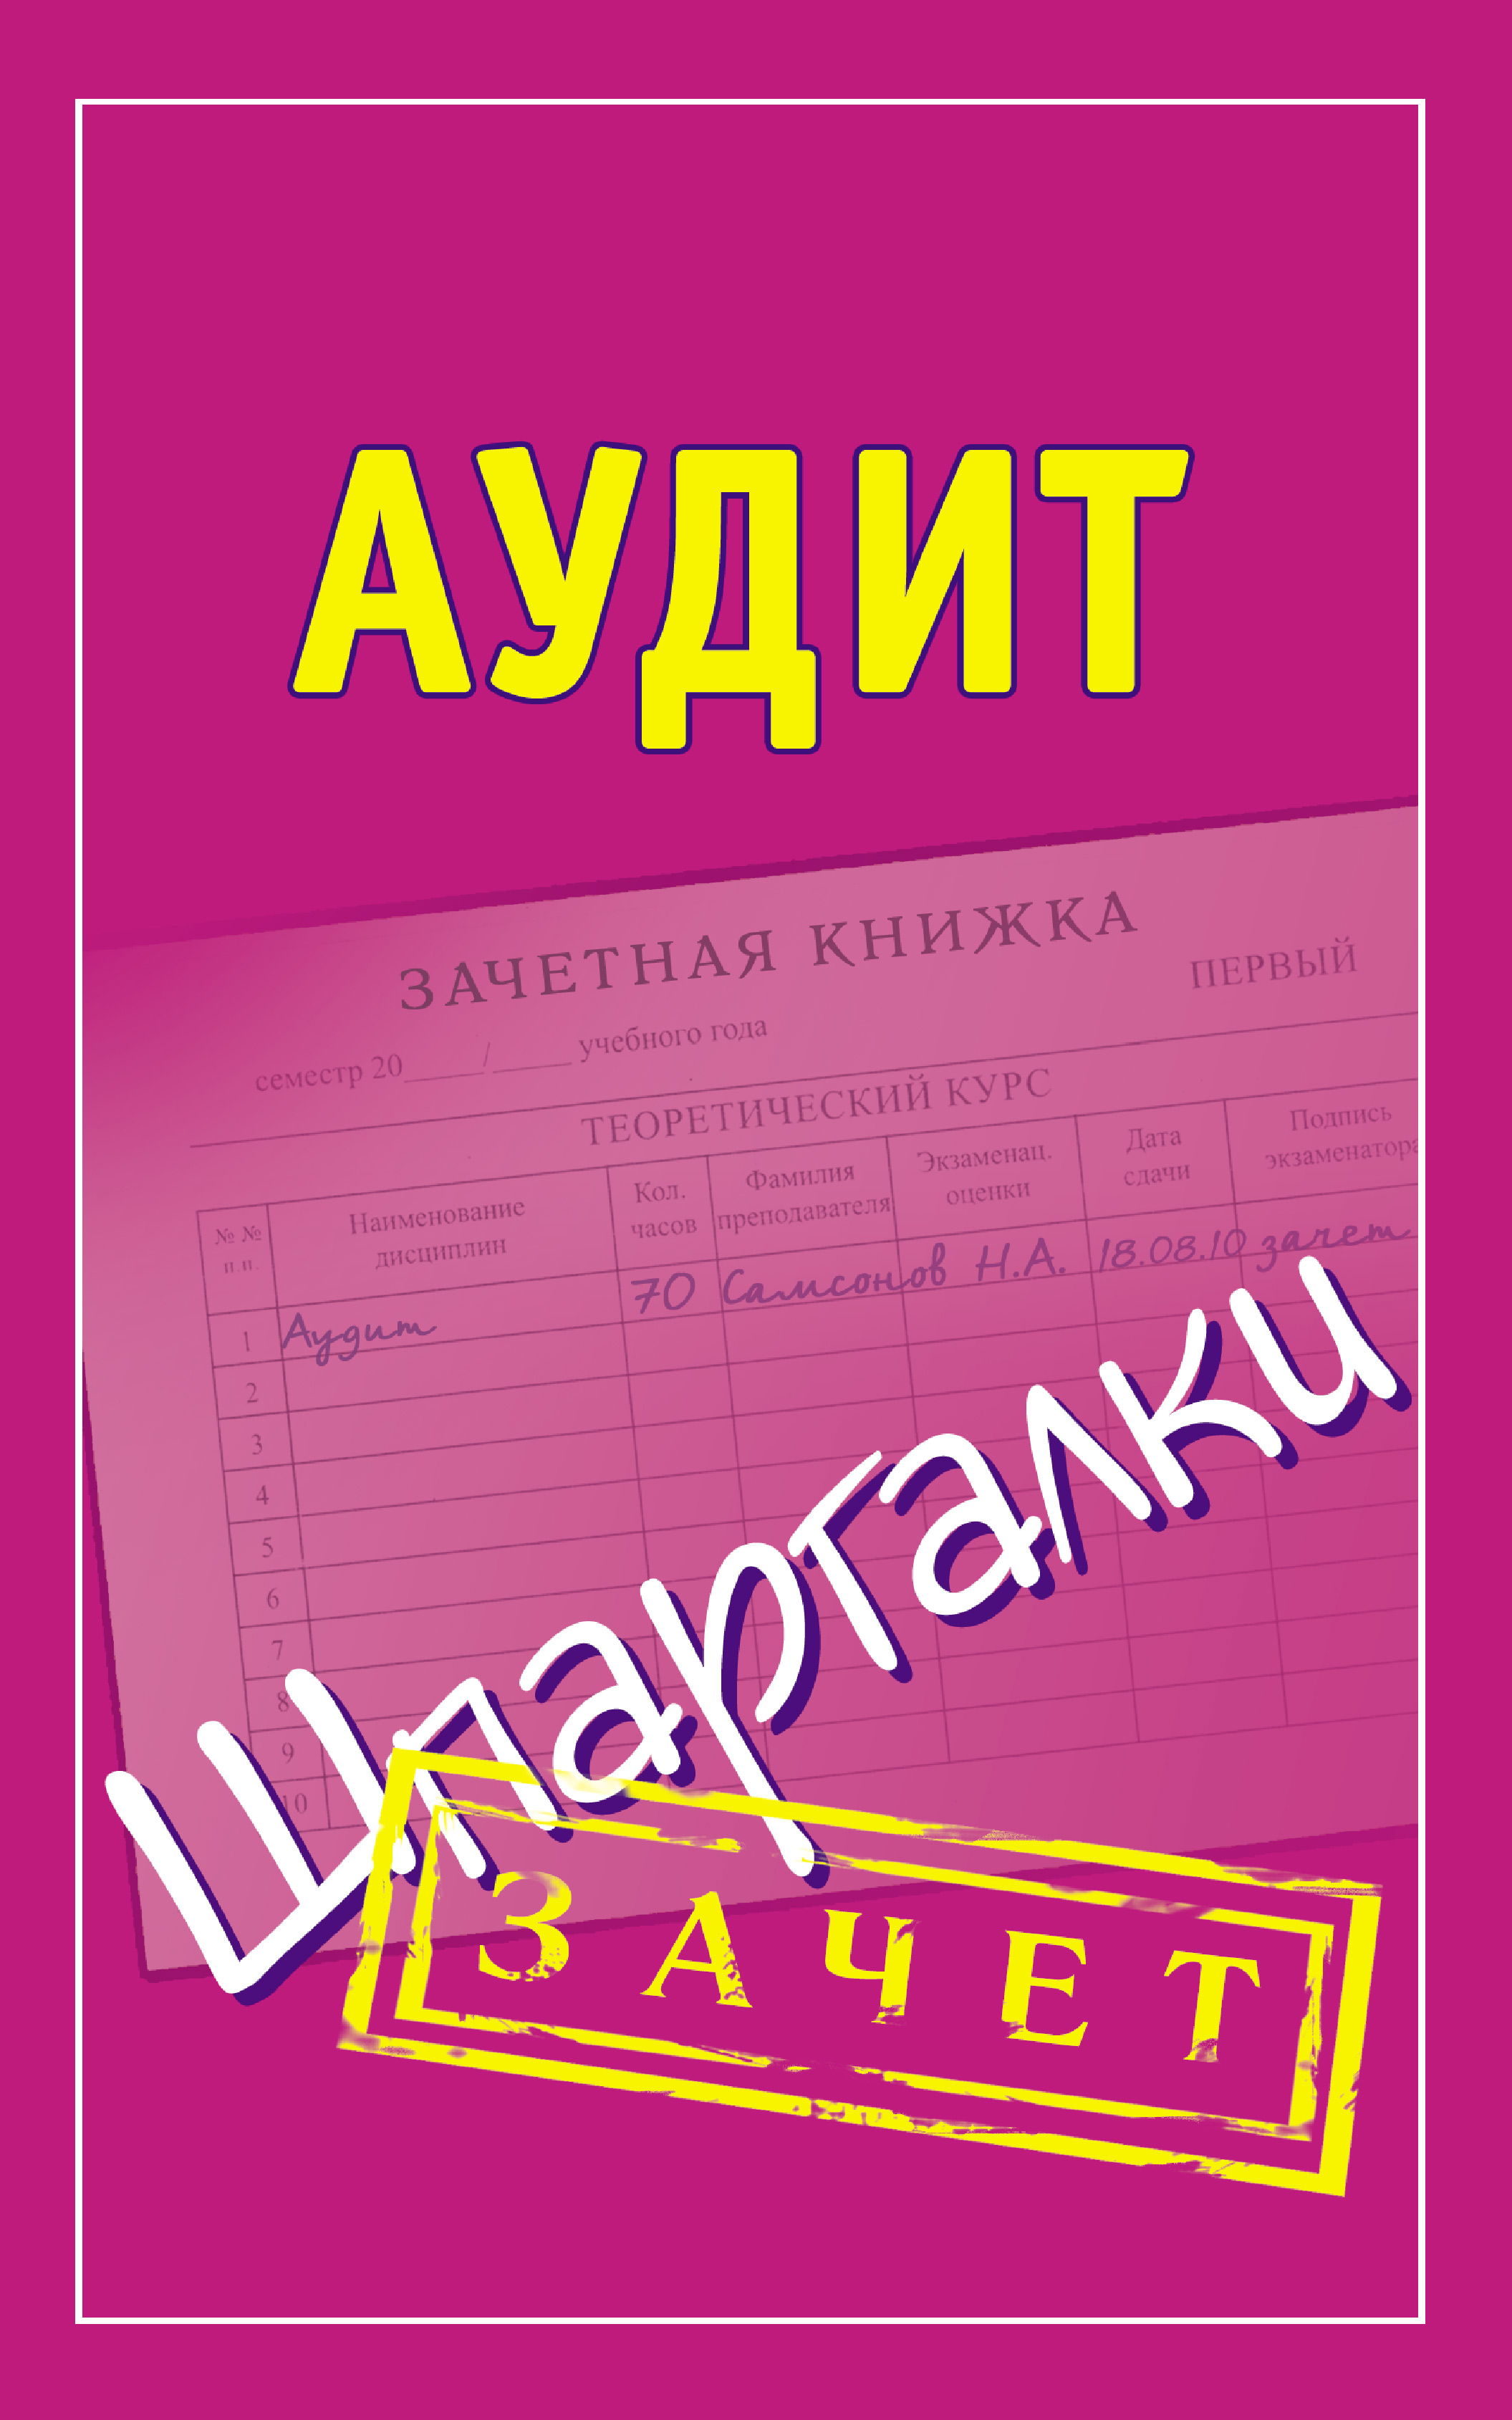 Обложка книги. Автор - Николай Самсонов